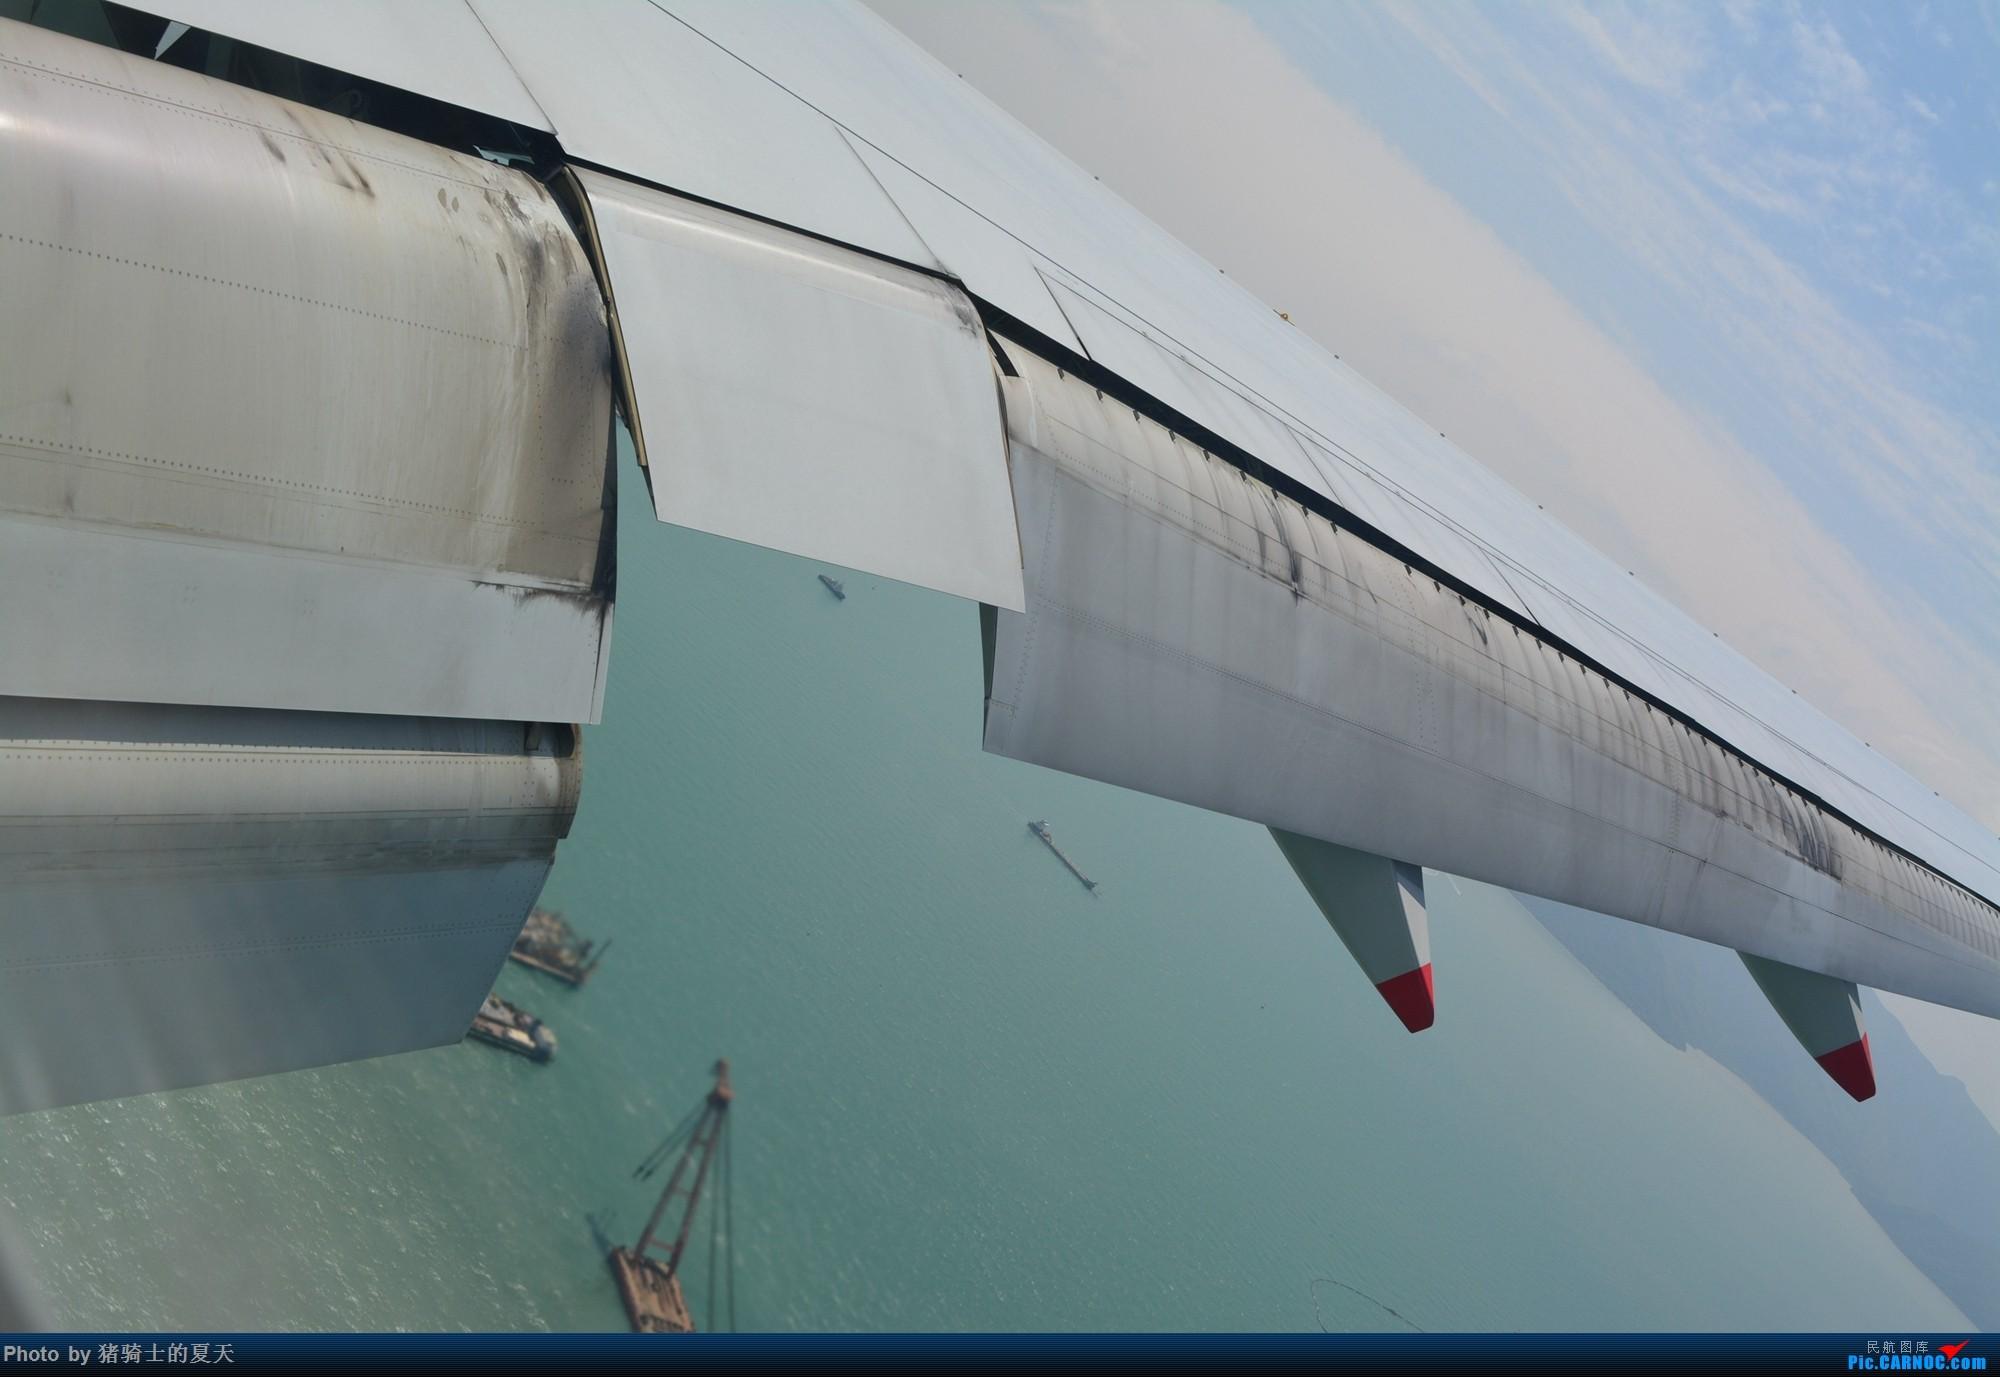 Re:[原创]2017年鸡鸭图 BOEING 777-300ER B-18053 中国香港国际机场